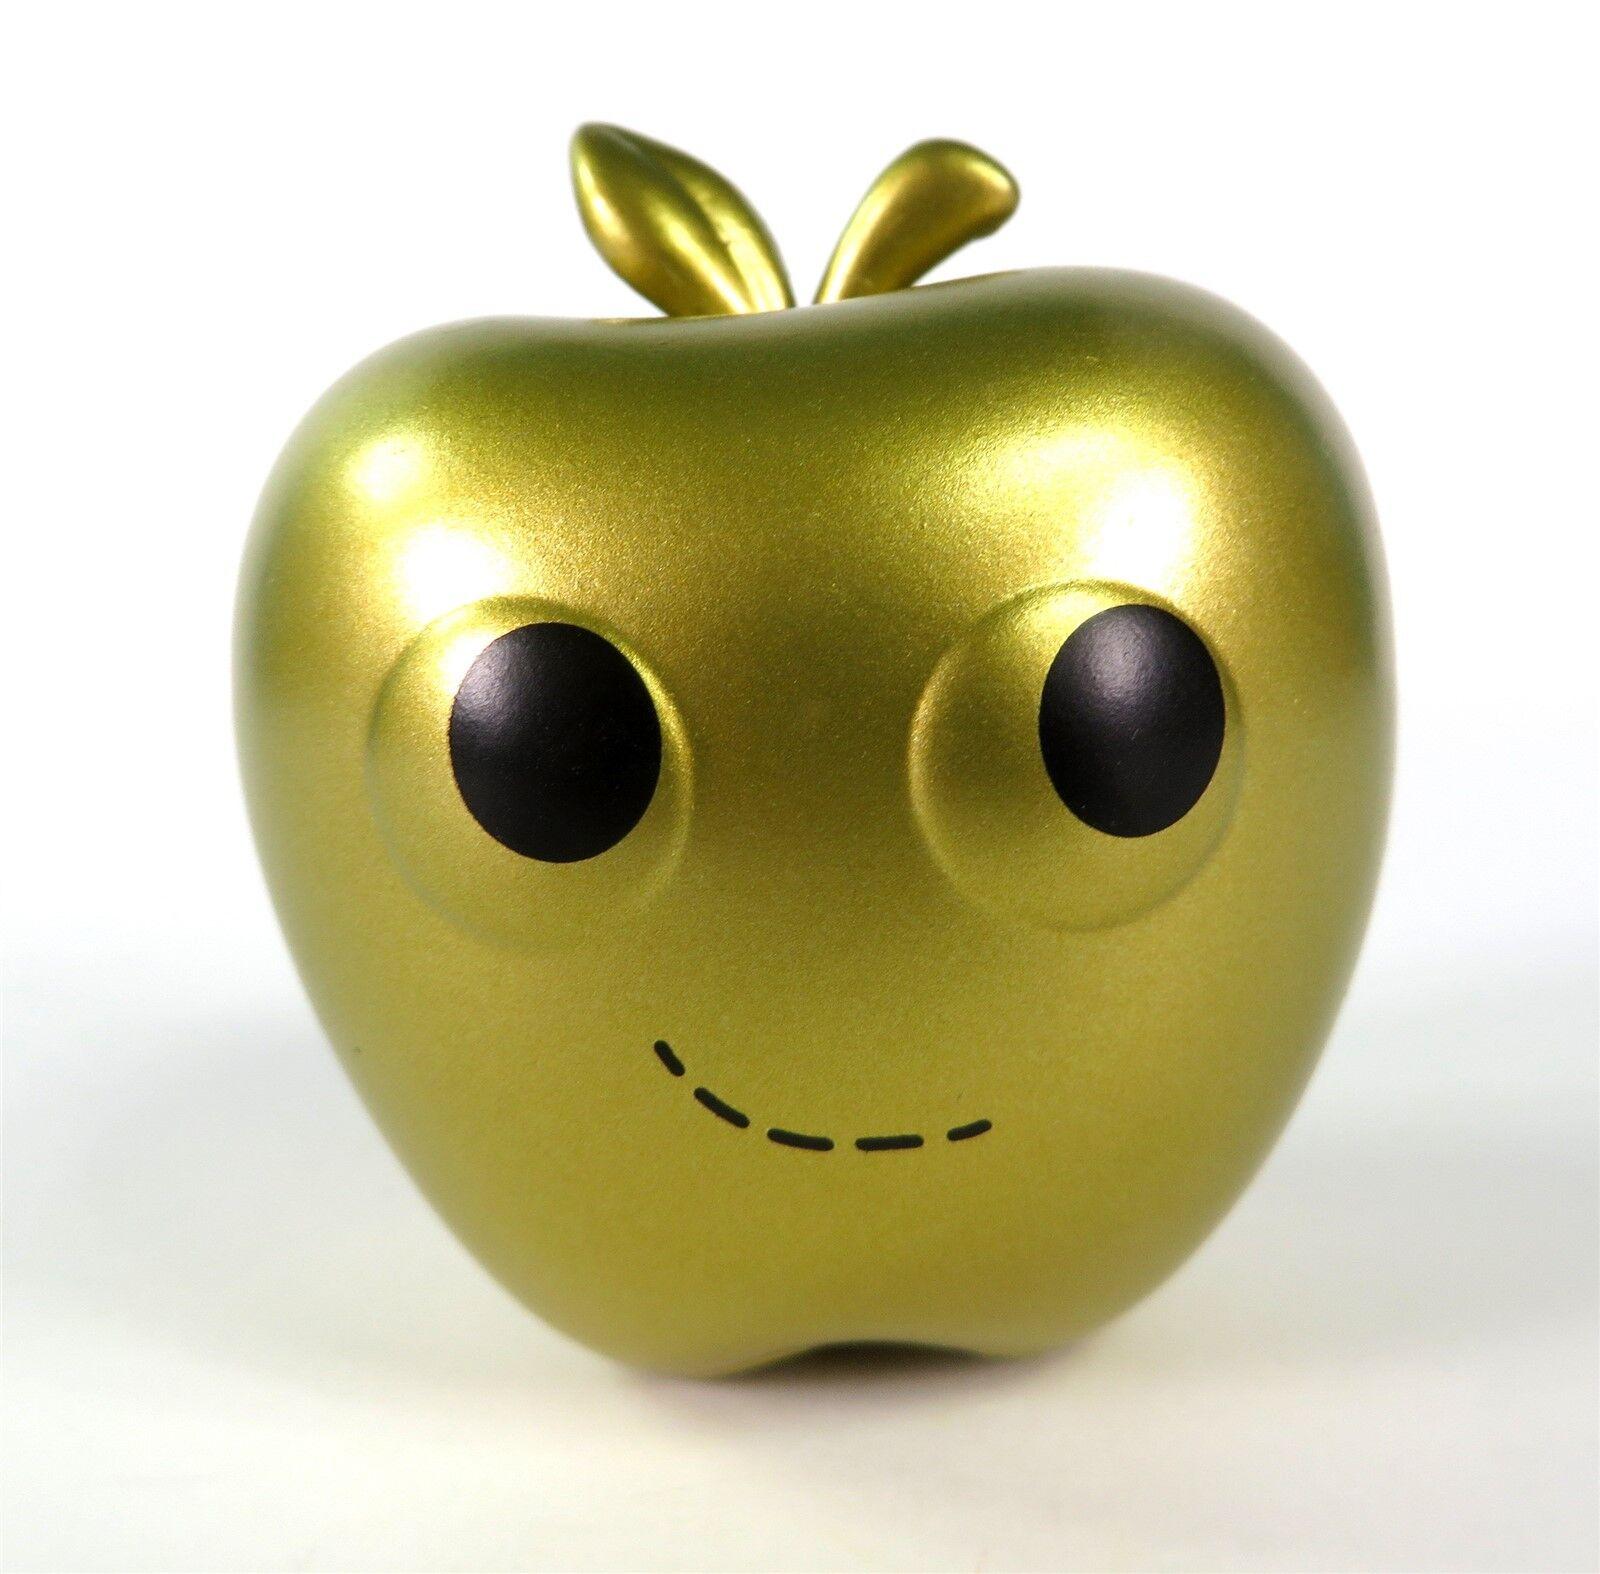 Kidrobot Kidrobot Kidrobot Yummy World Vinyl Series Tasty Treats golden Apple Figure NEW 79d380